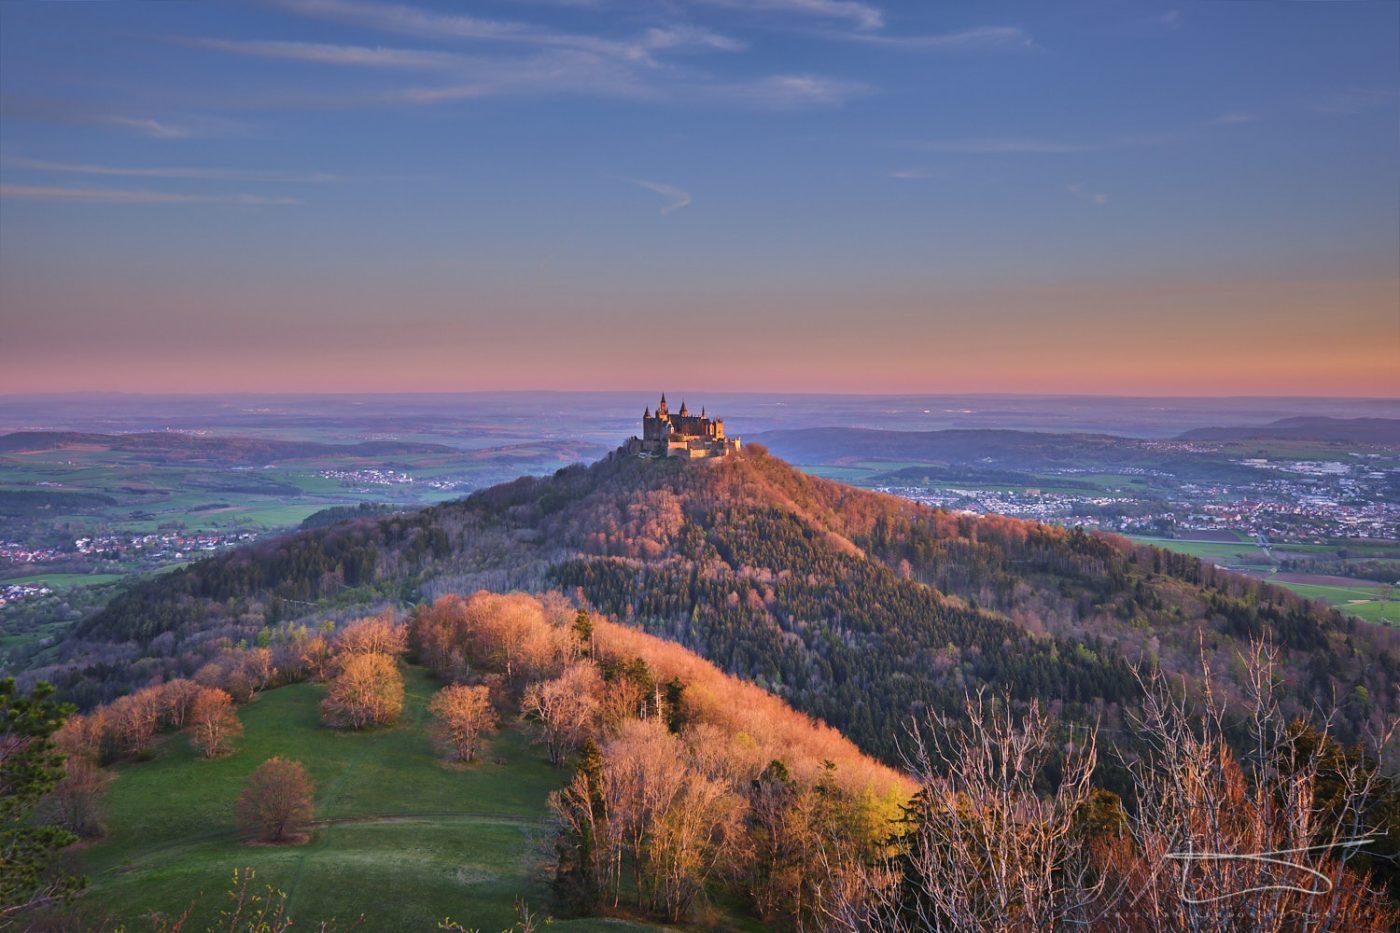 Sunrise over Hohenzollern castle